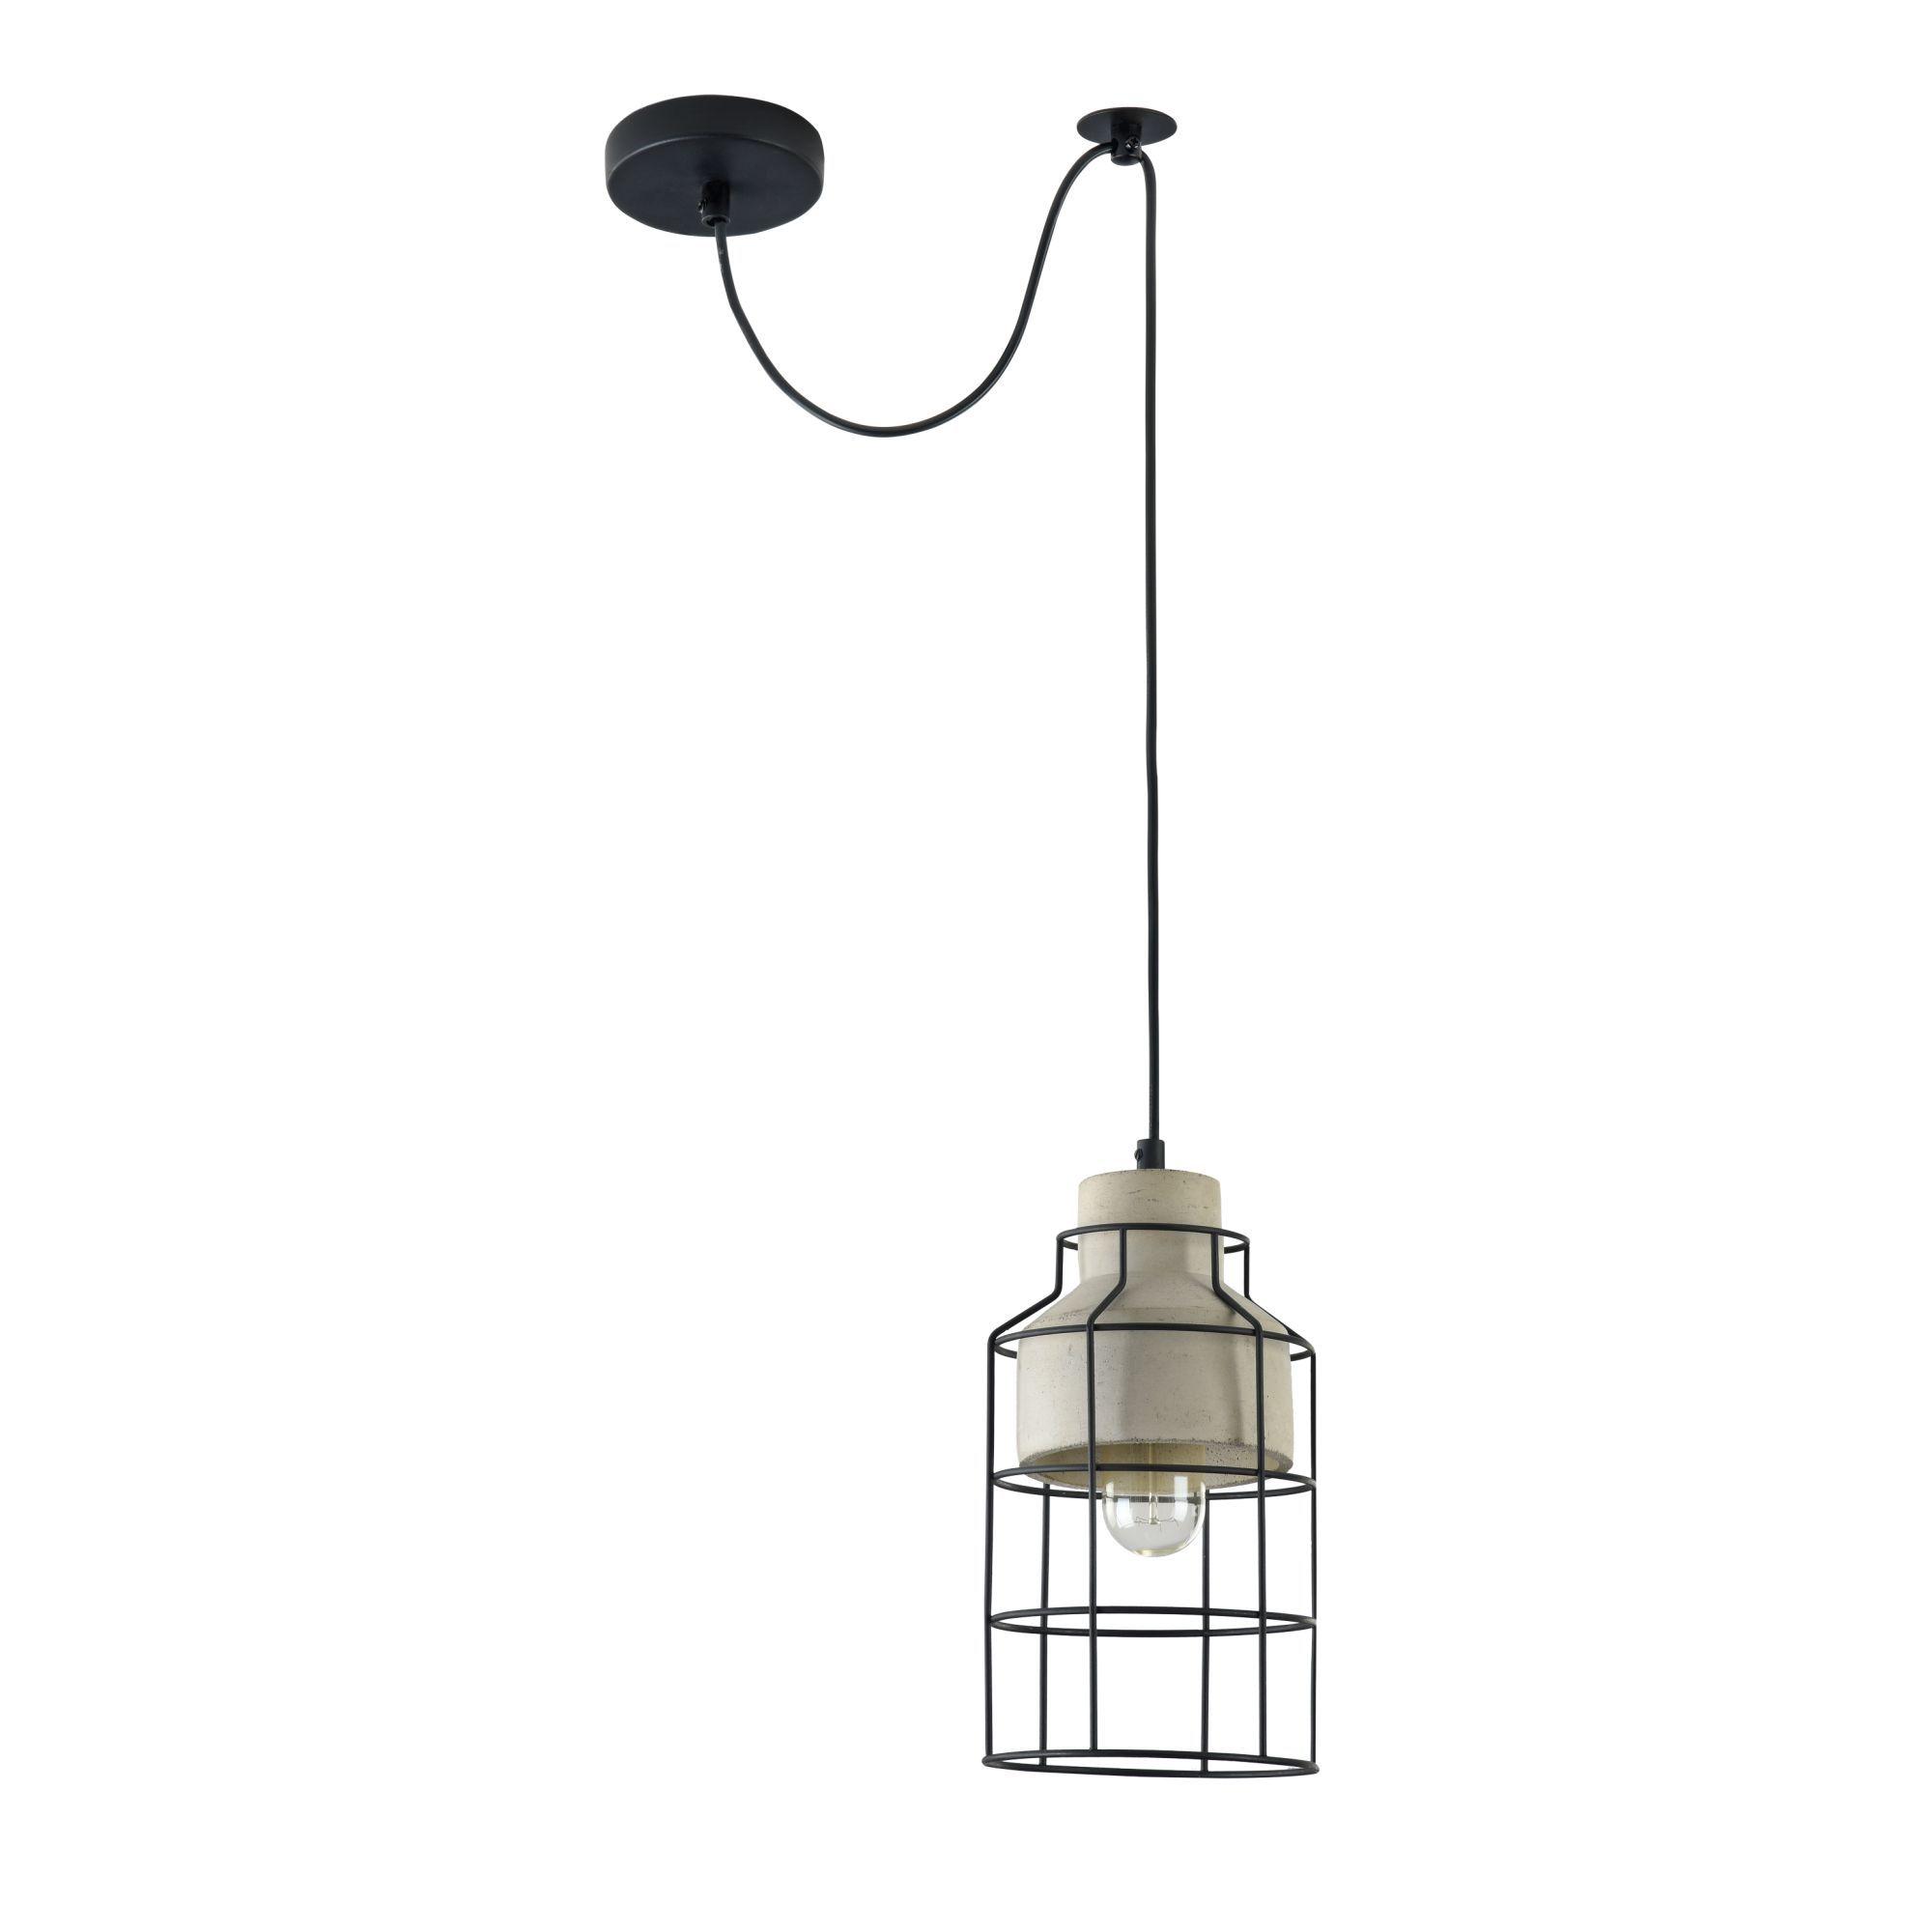 Подвесной светильник Maytoni Gosford T441-PL-01-GR, 1xE27x60W, черный, серый, металл, бетон - фото 3